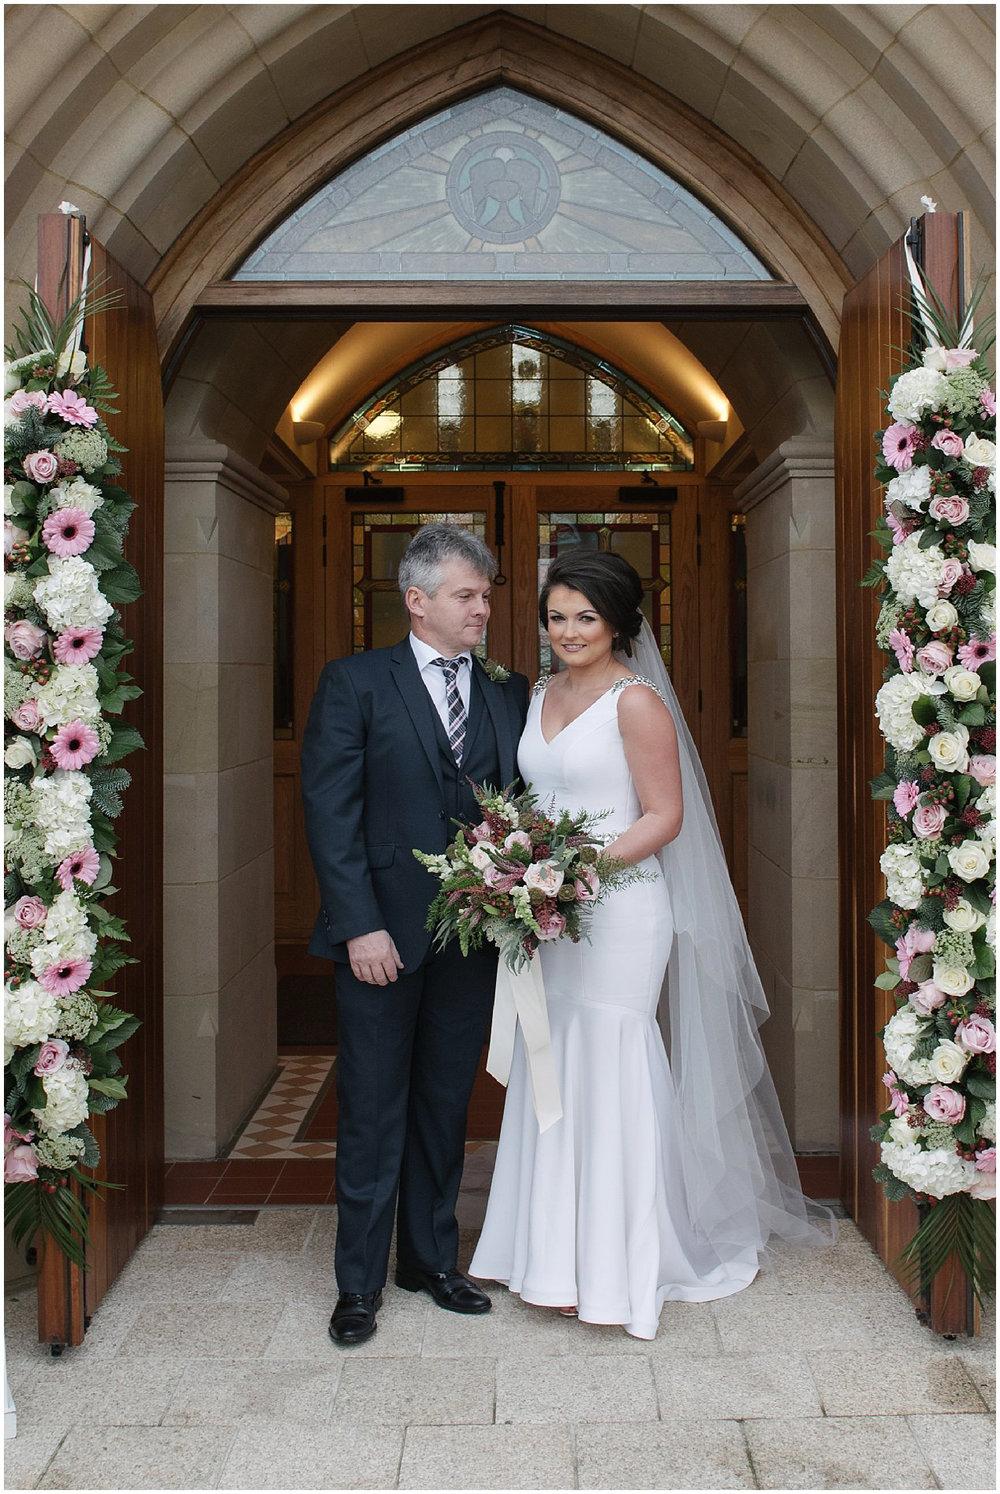 kerri_dave_ballymascanlon_house_hotel_wedding_0038.jpg